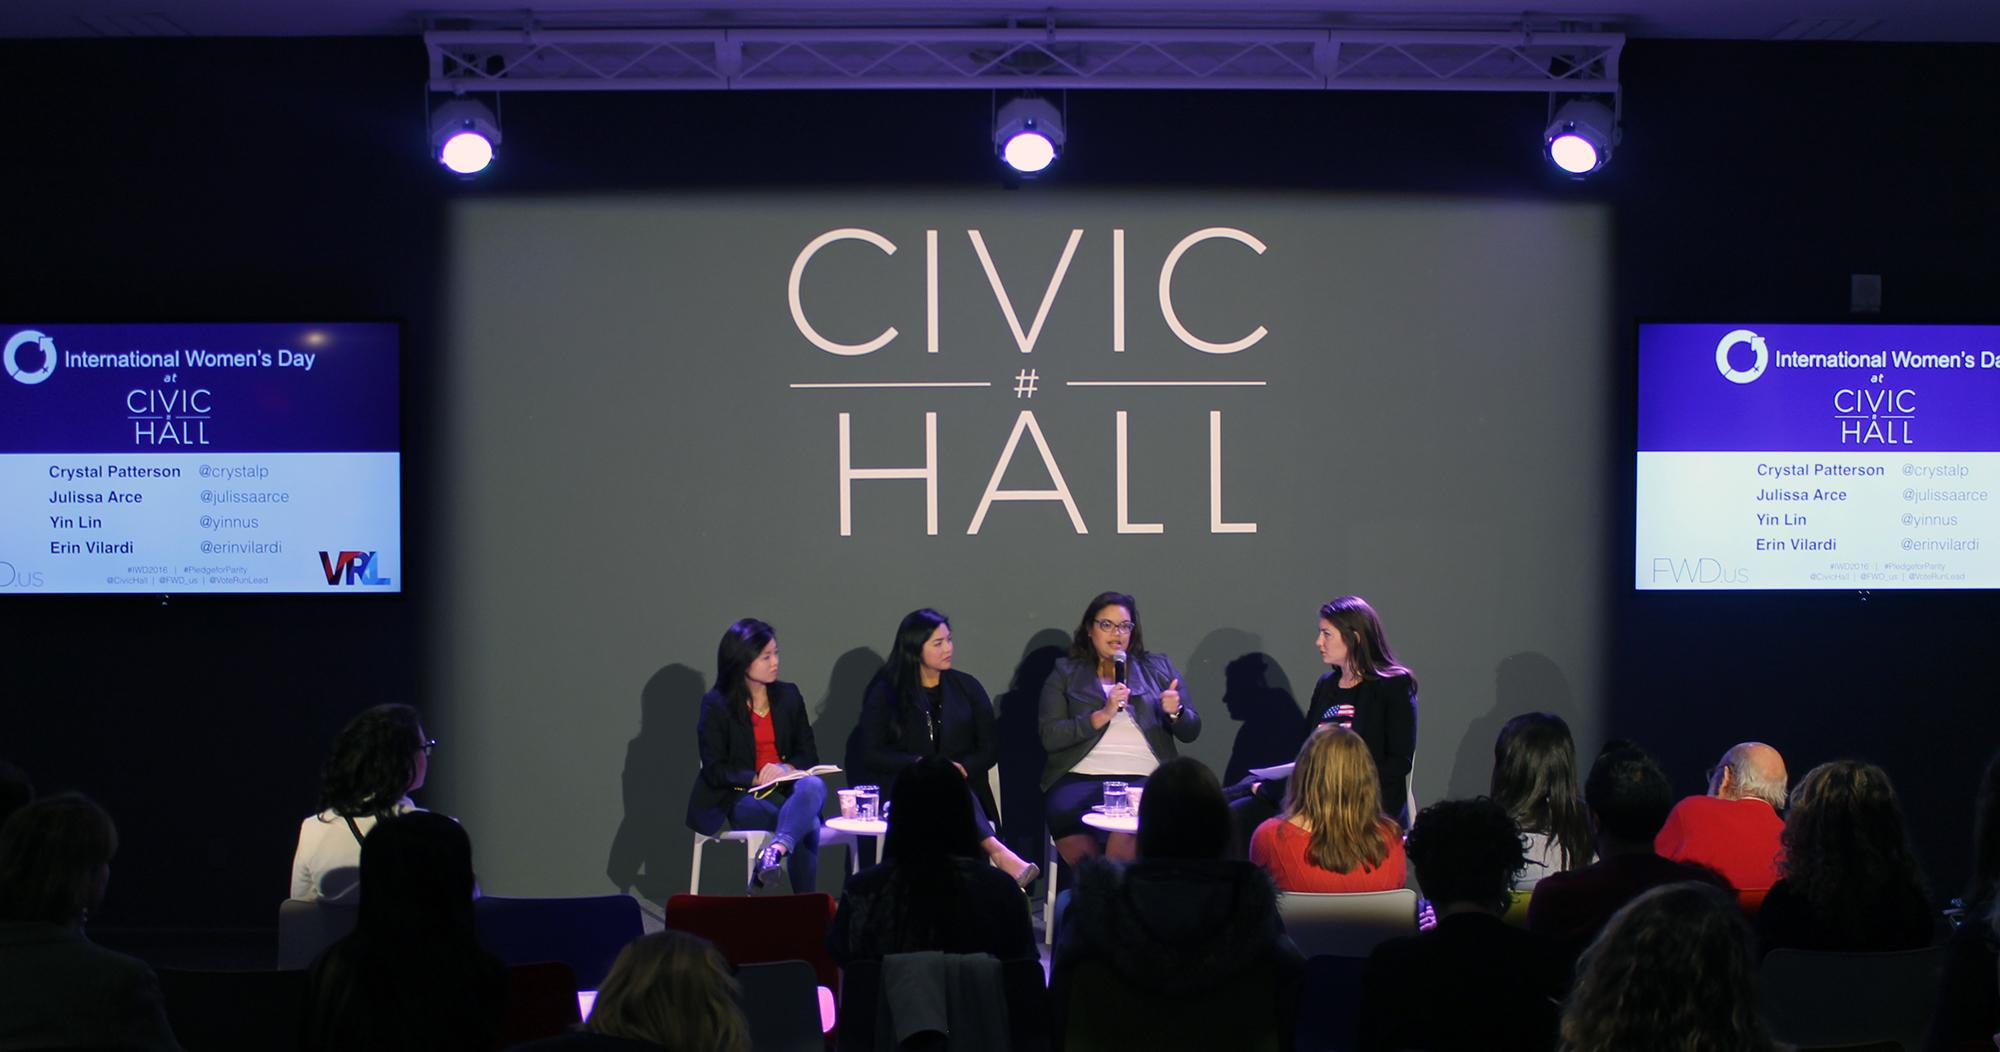 INTERNATIONAL WOMEN'S DAY CELEBRATION AT CIVIC HALL: Women, Entrepreneurship, and Politics